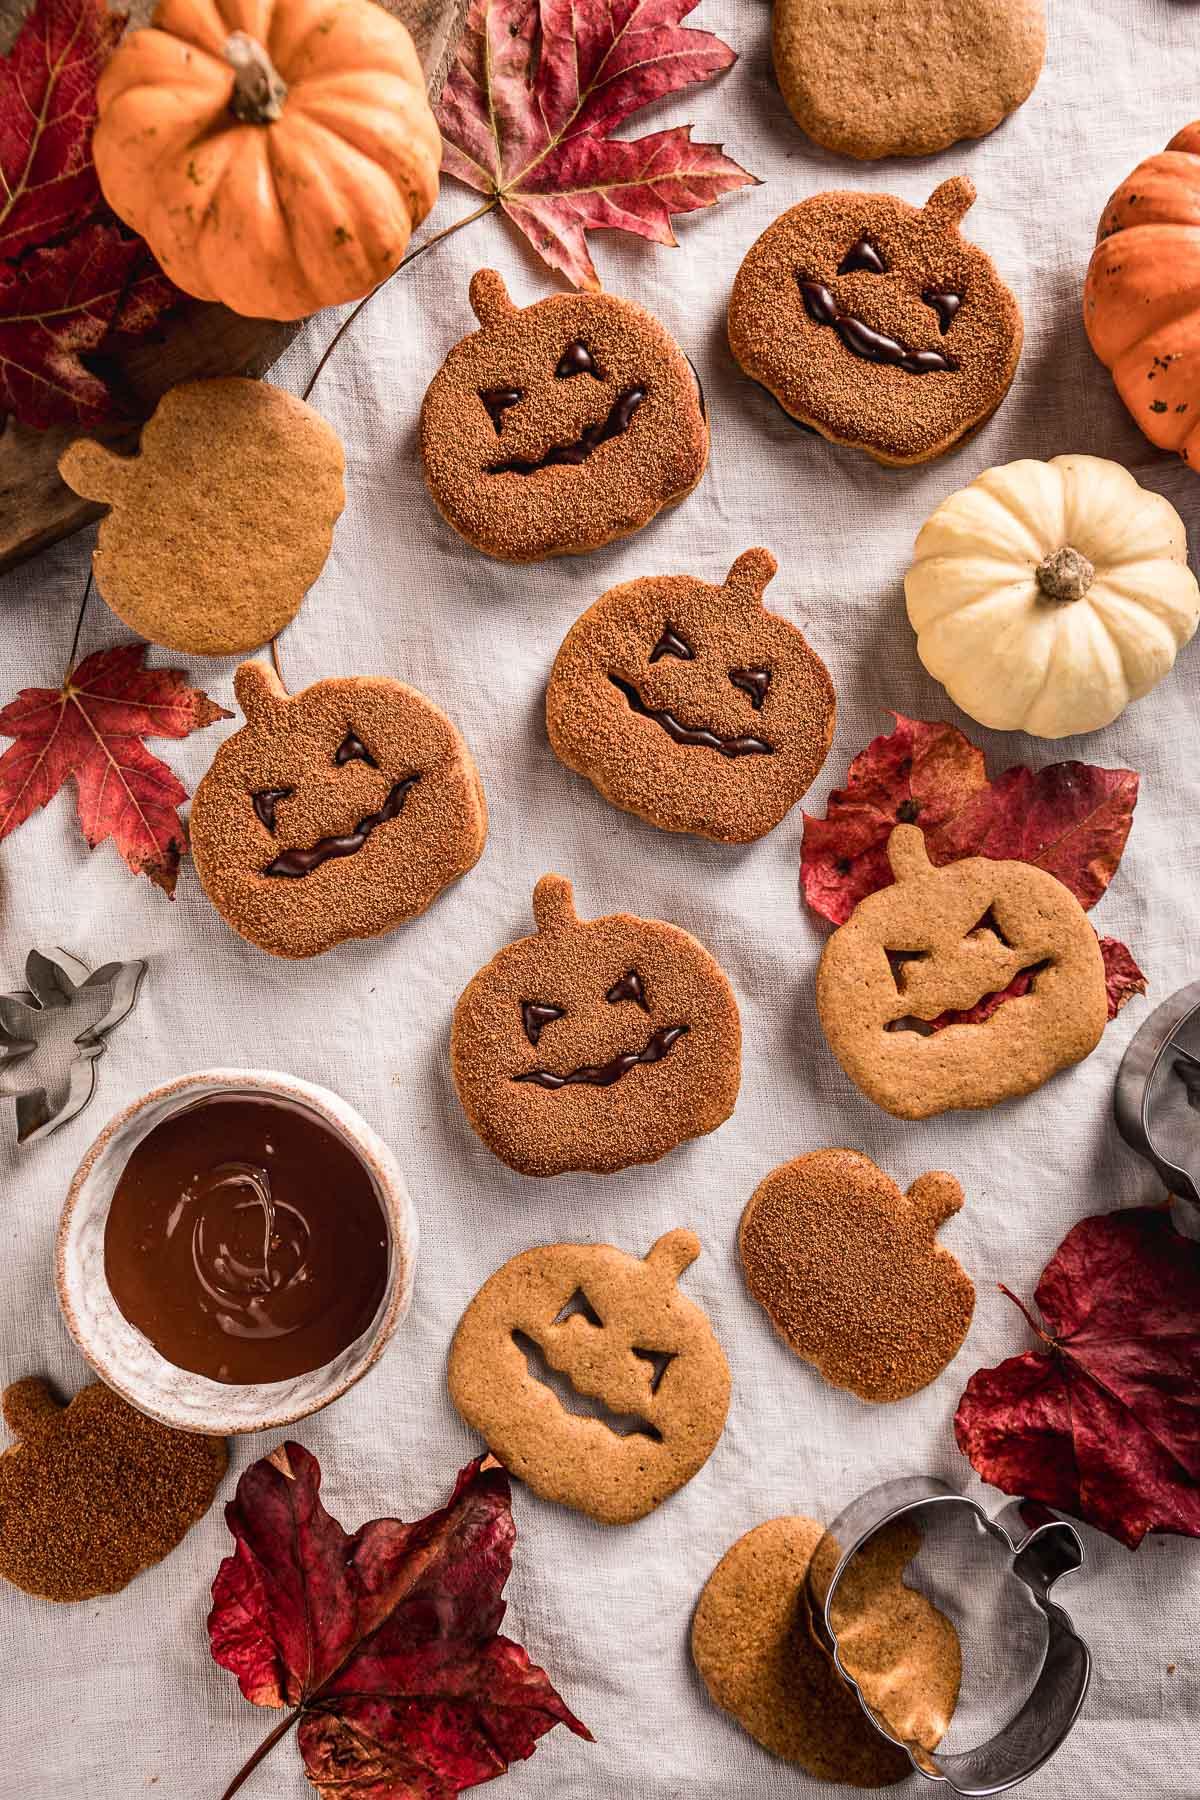 vegan pumpkin cutout cookies recipe cinnamon sugar Halloween cookies Jack O Lantern ricetta biscotti vegan alla zucca frollini integrali senza uova senza burro